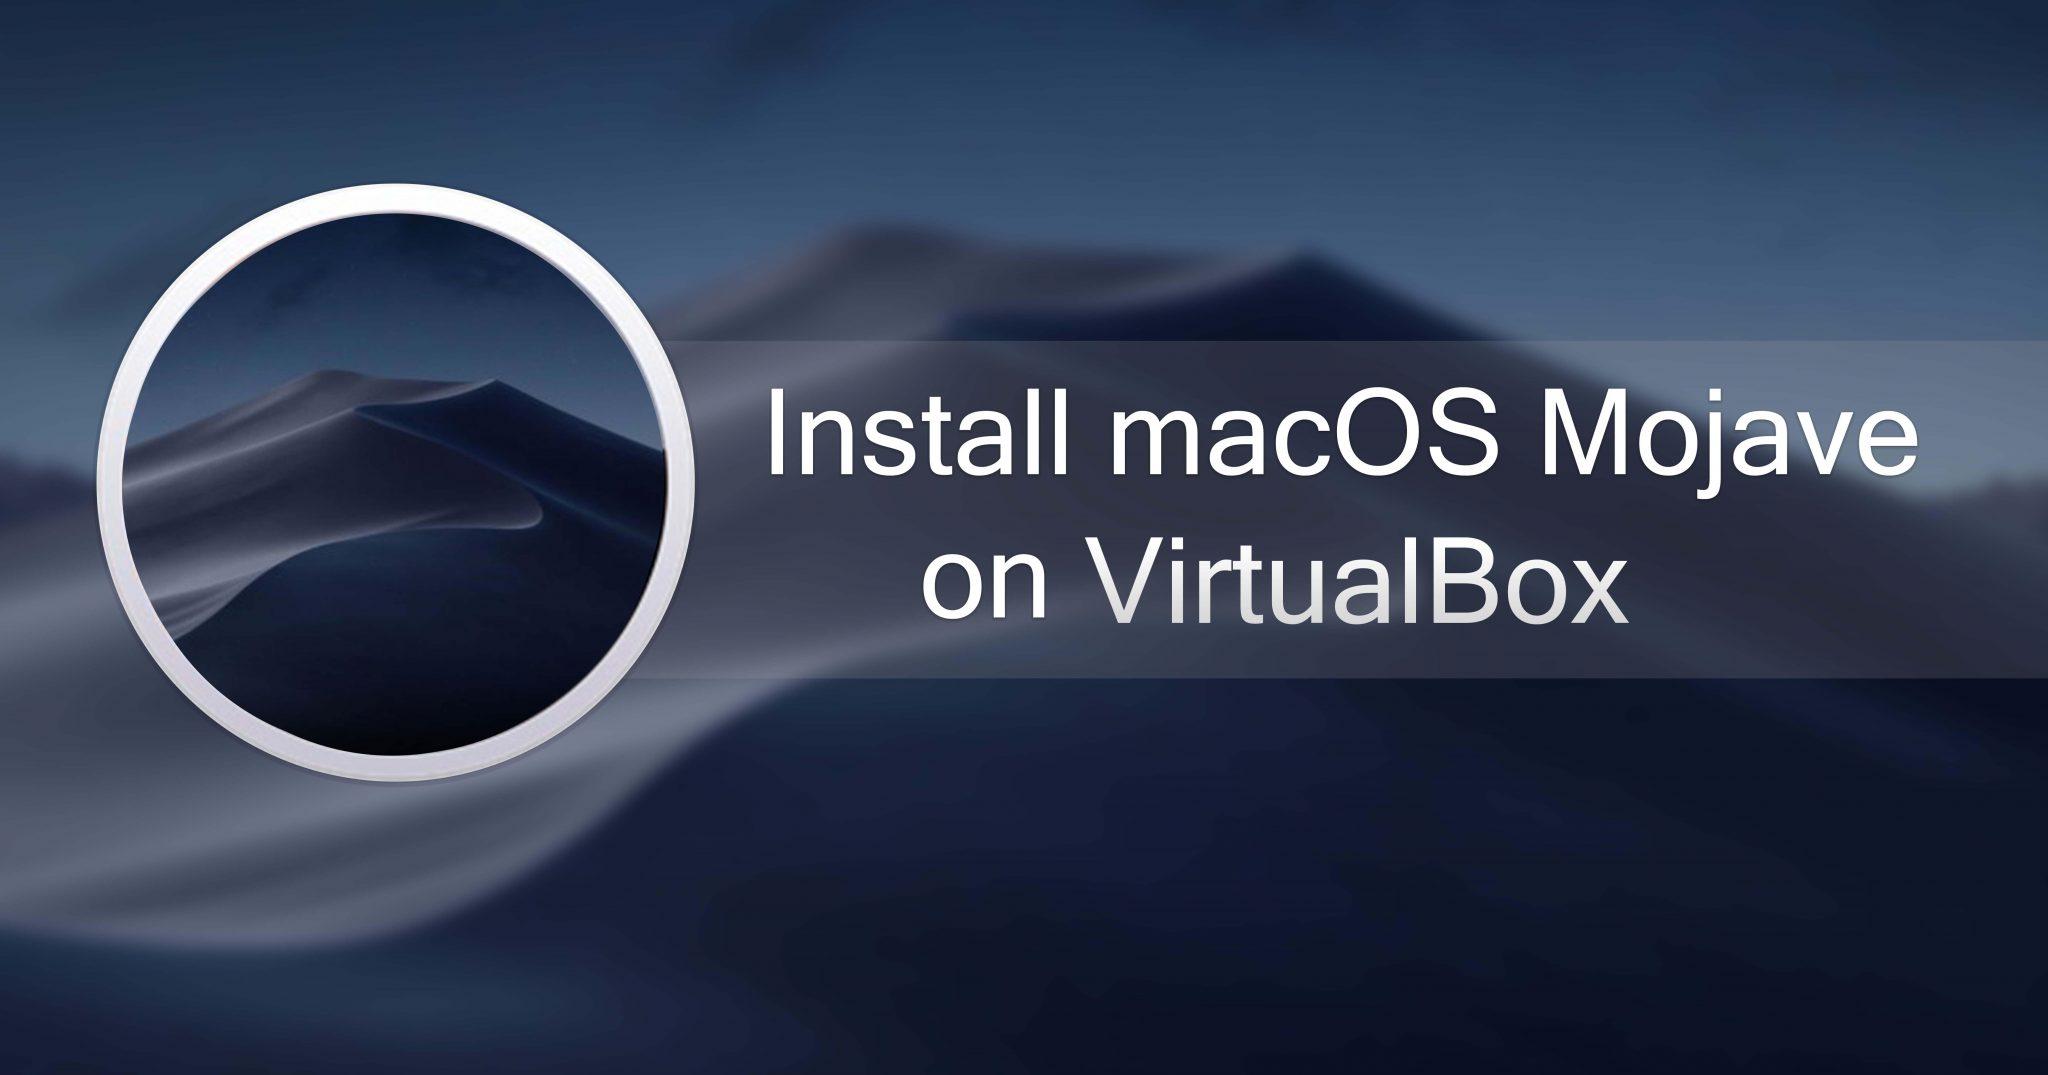 download virtualbox 5.2.22 64 bit windows 10